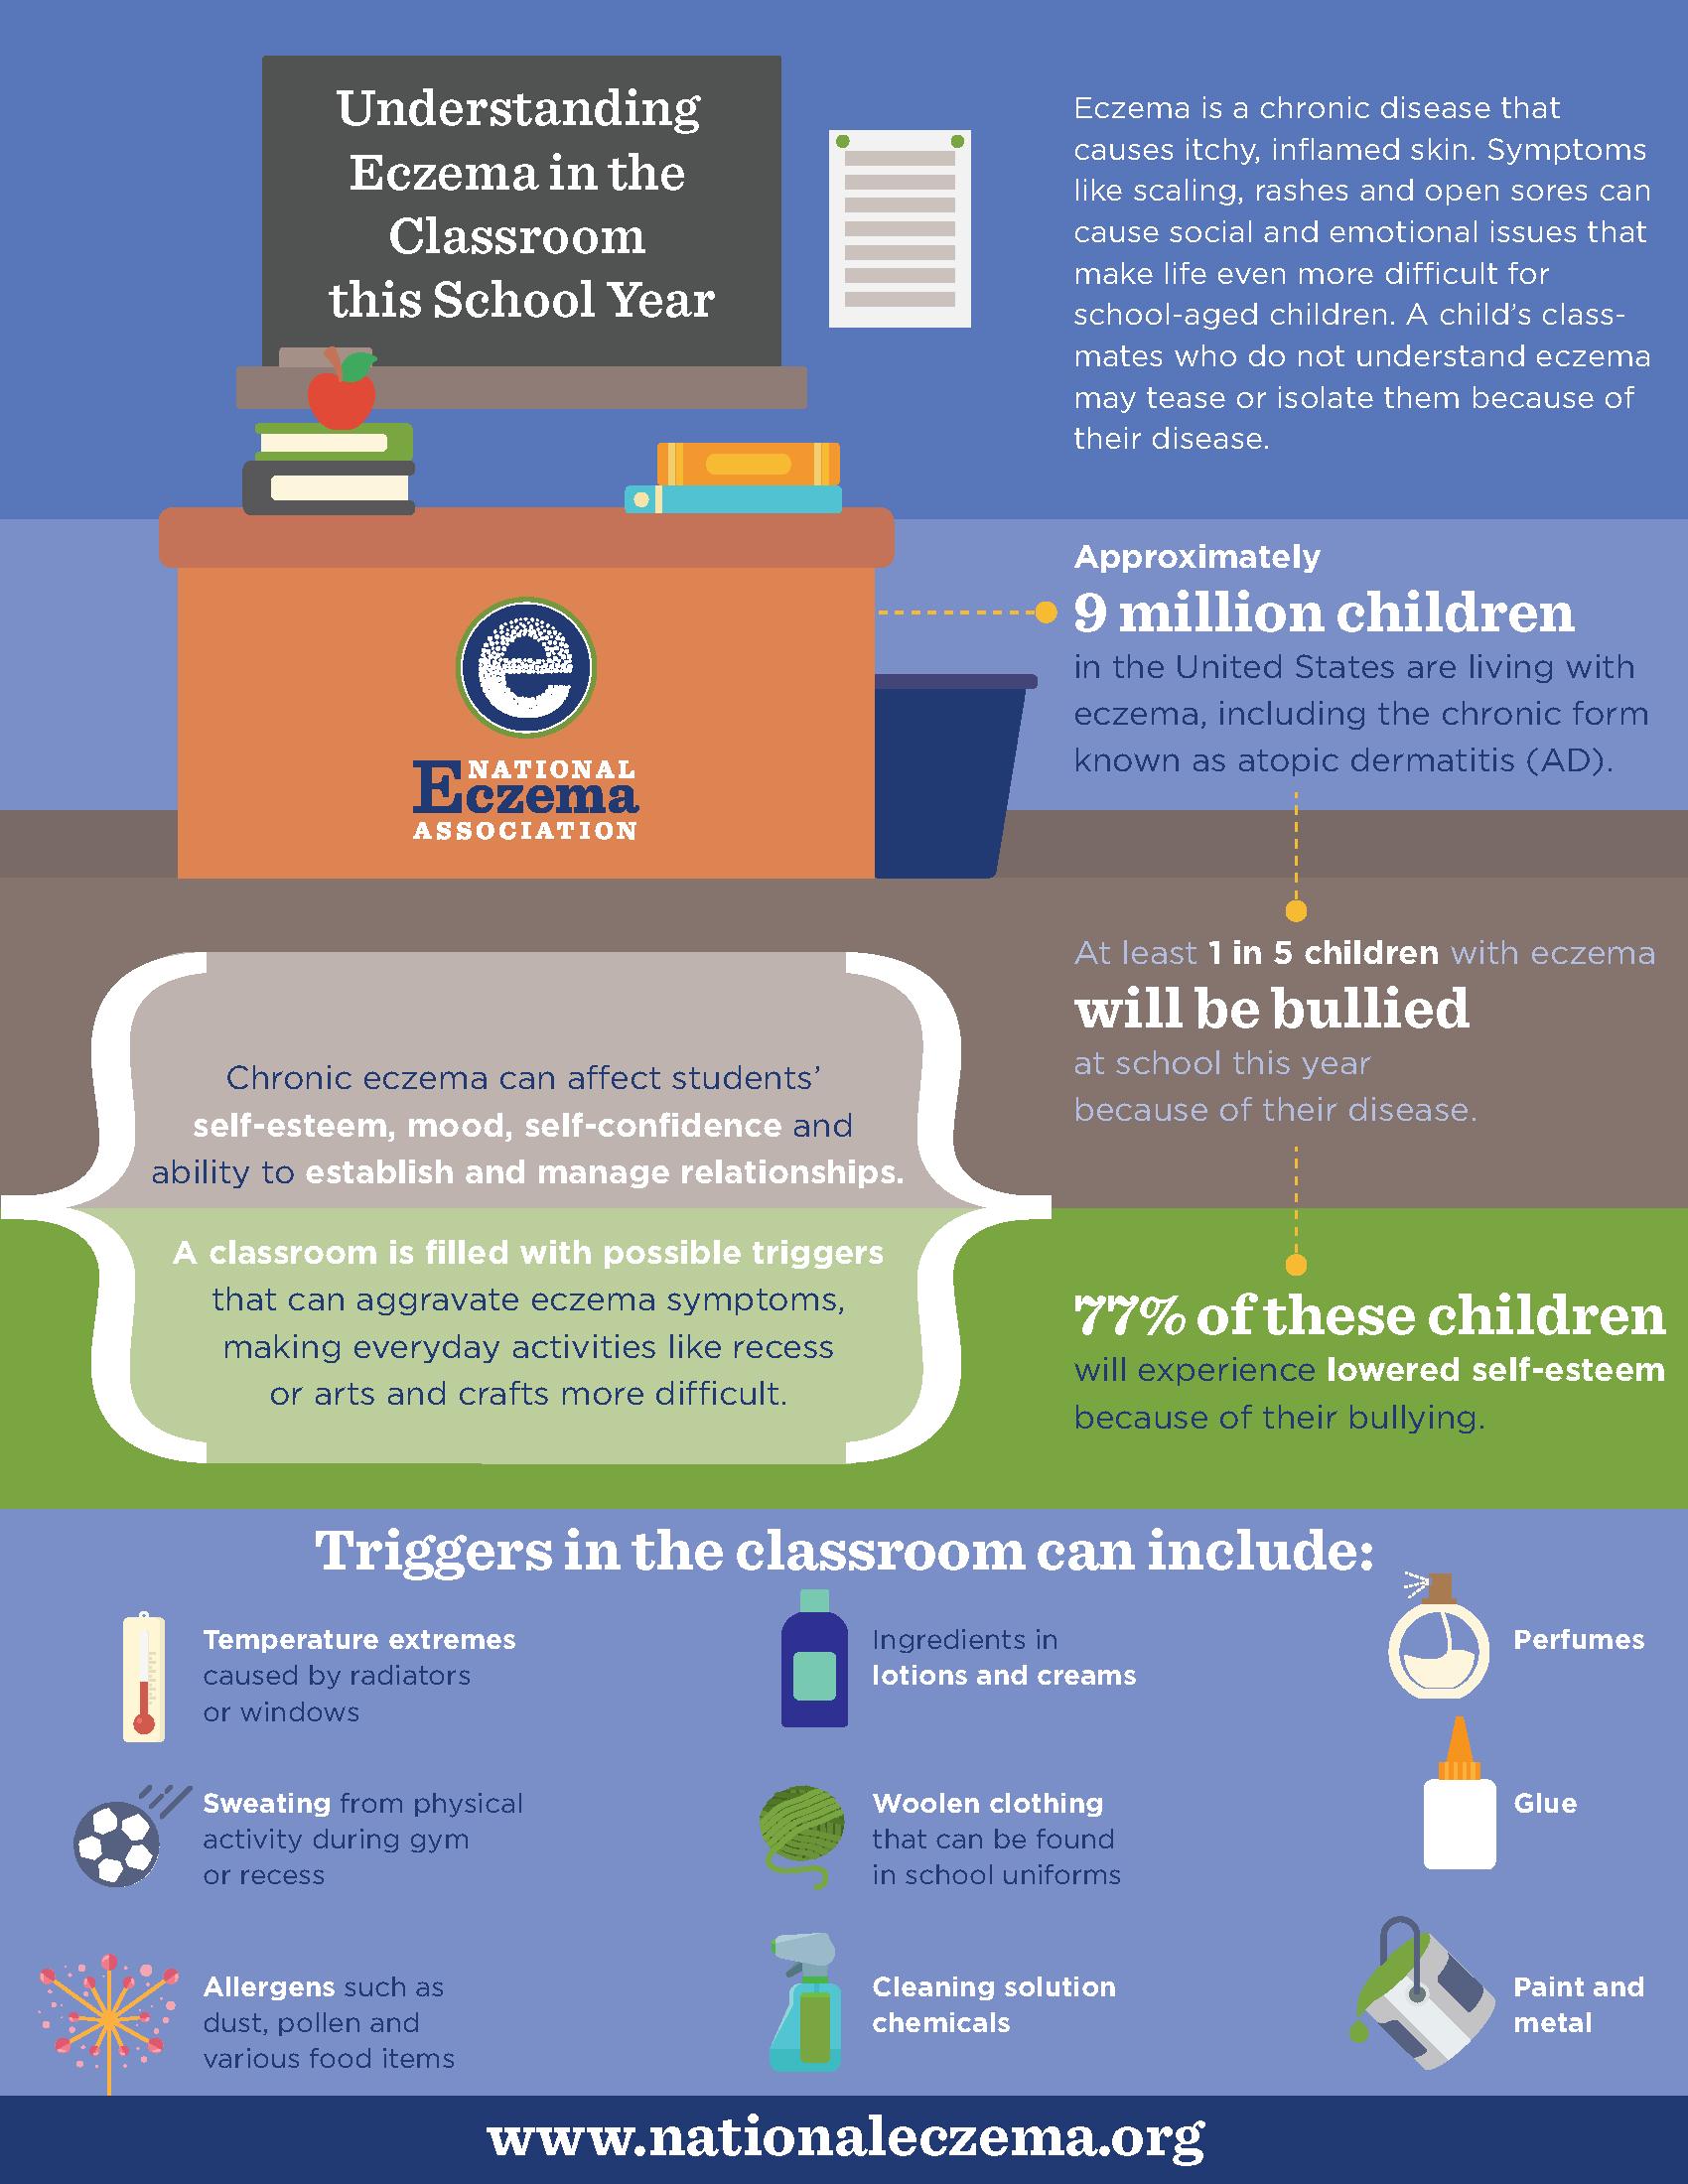 child-eczema-infographic